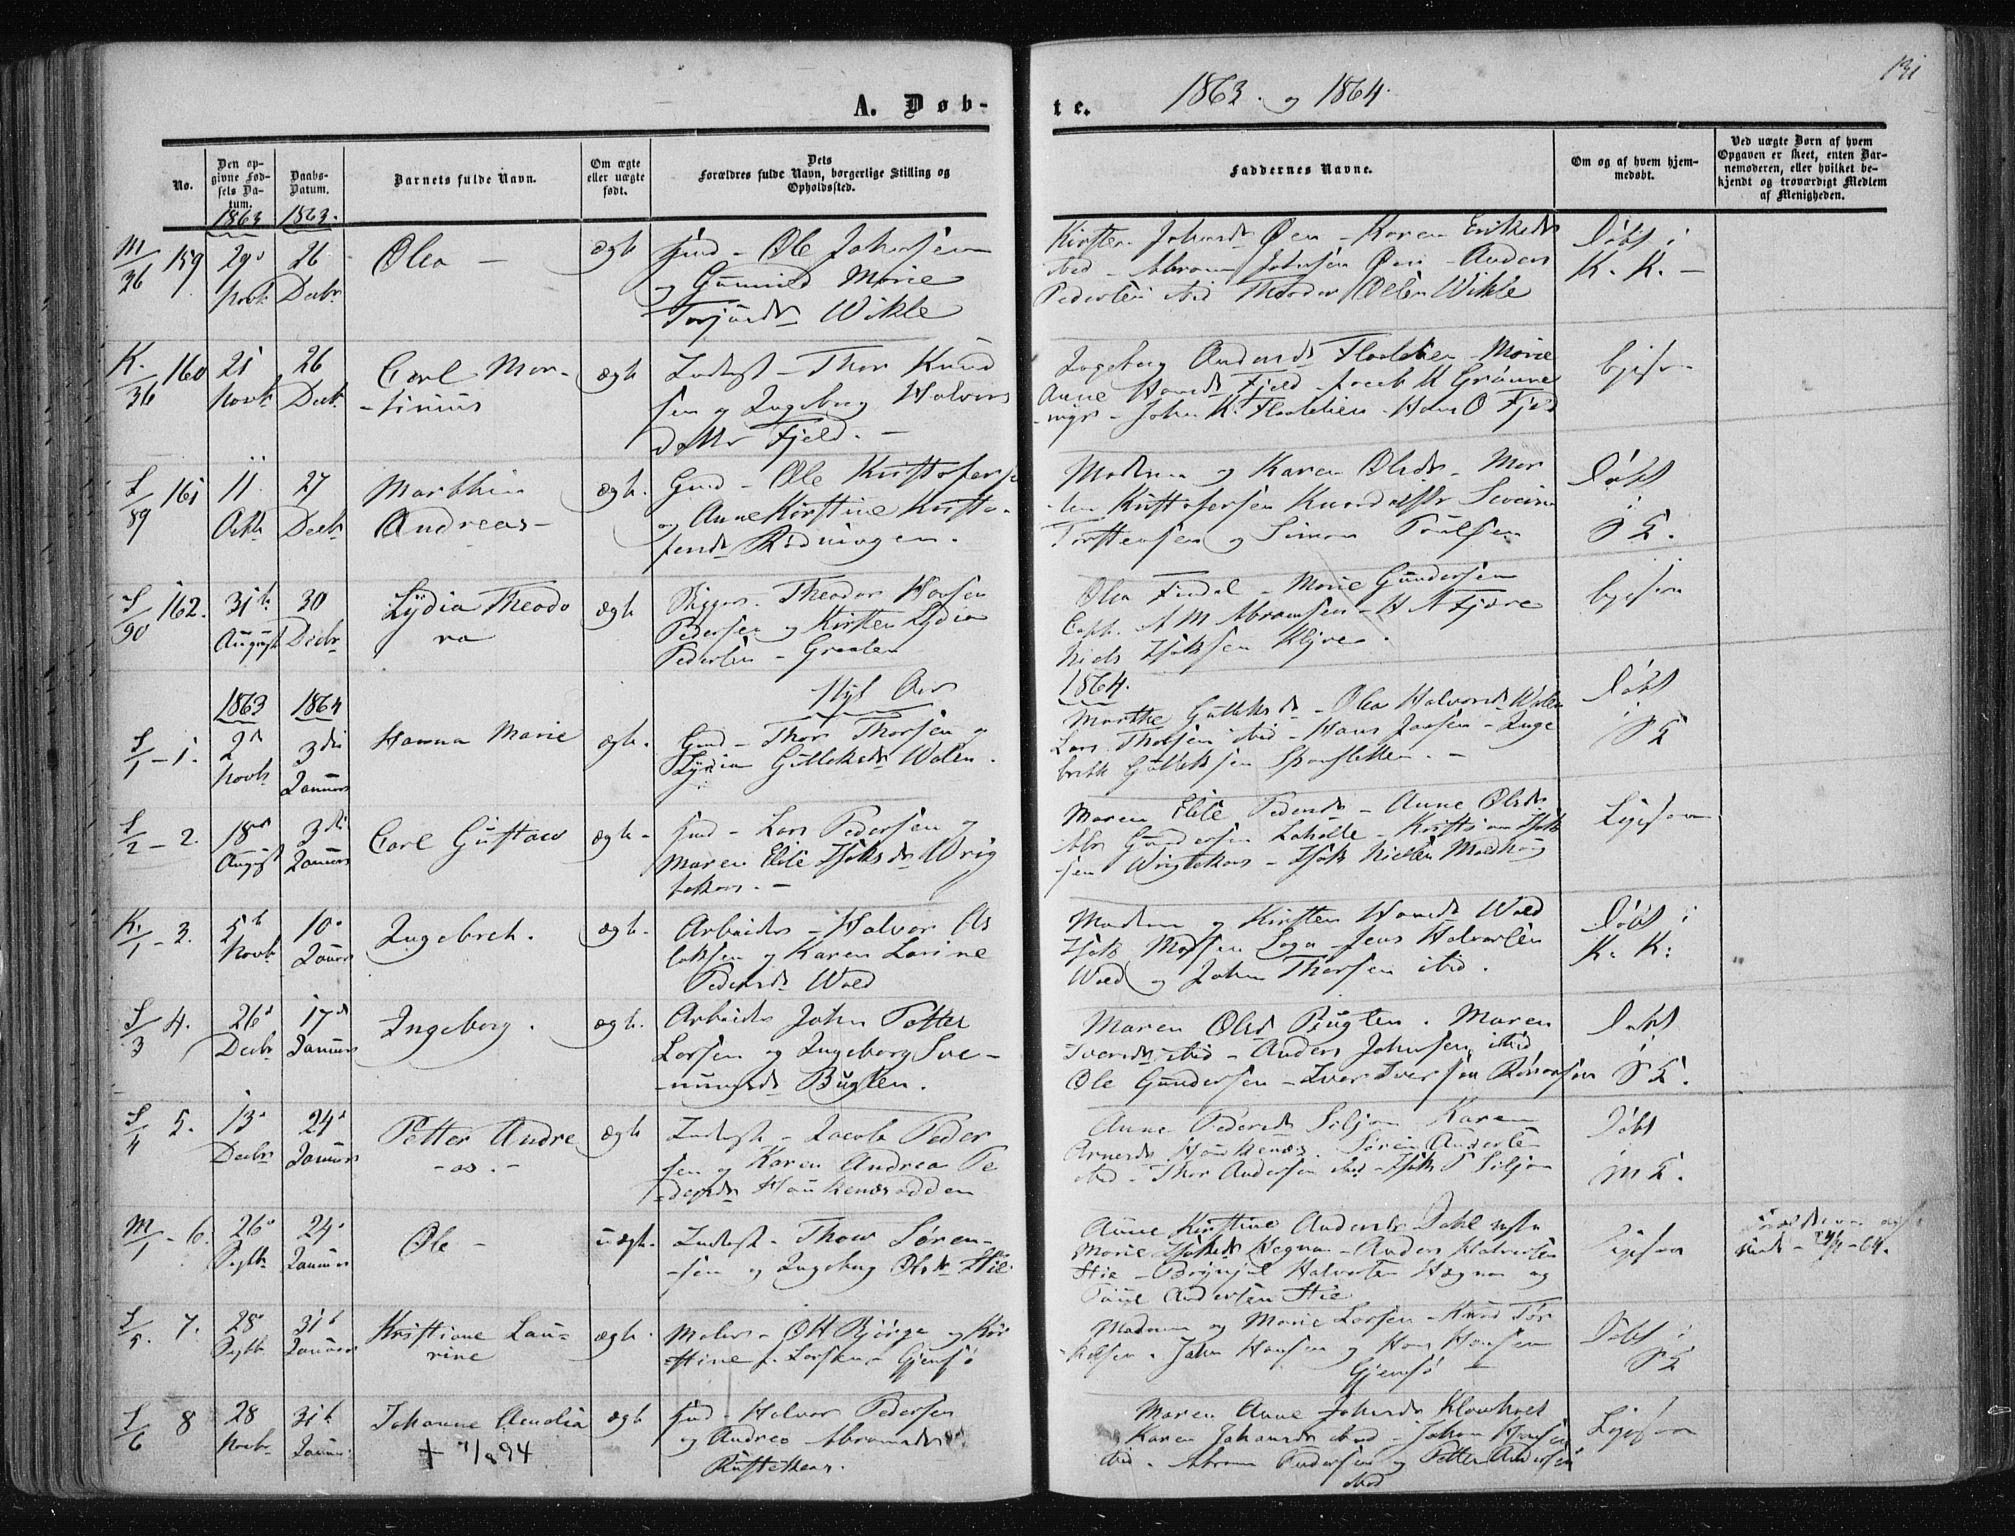 SAKO, Solum kirkebøker, F/Fa/L0007: Ministerialbok nr. I 7, 1856-1864, s. 131